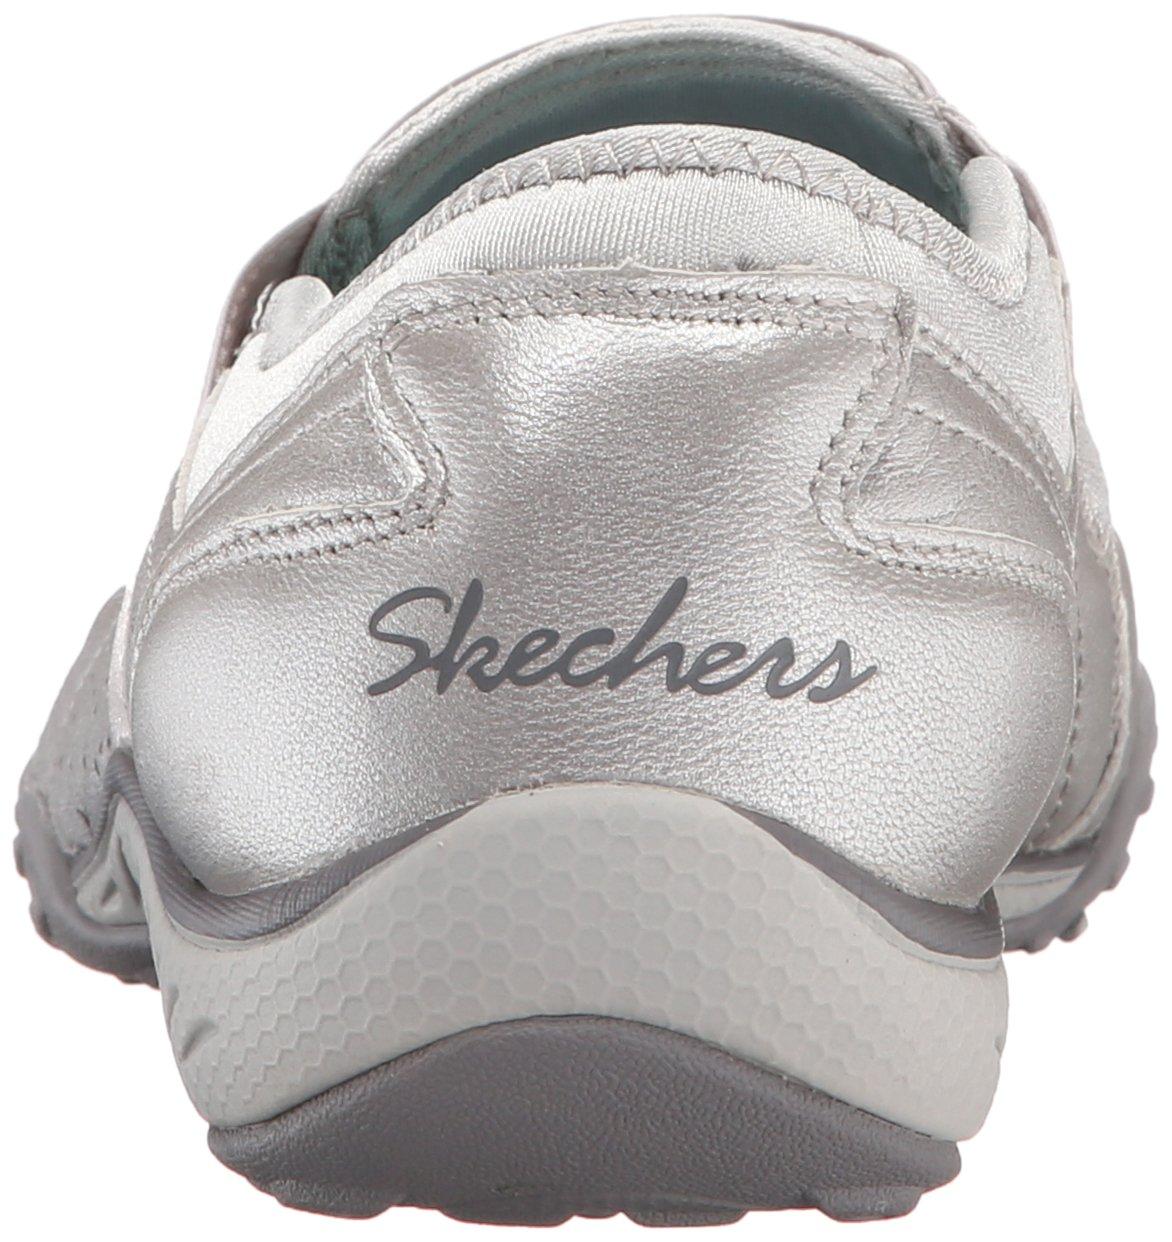 f72cb6cc5737 ... Skechers Our Sport Women s Beathe Easy Our Skechers Song Fashion  Sneaker B015IZCG76 10 B(M ...